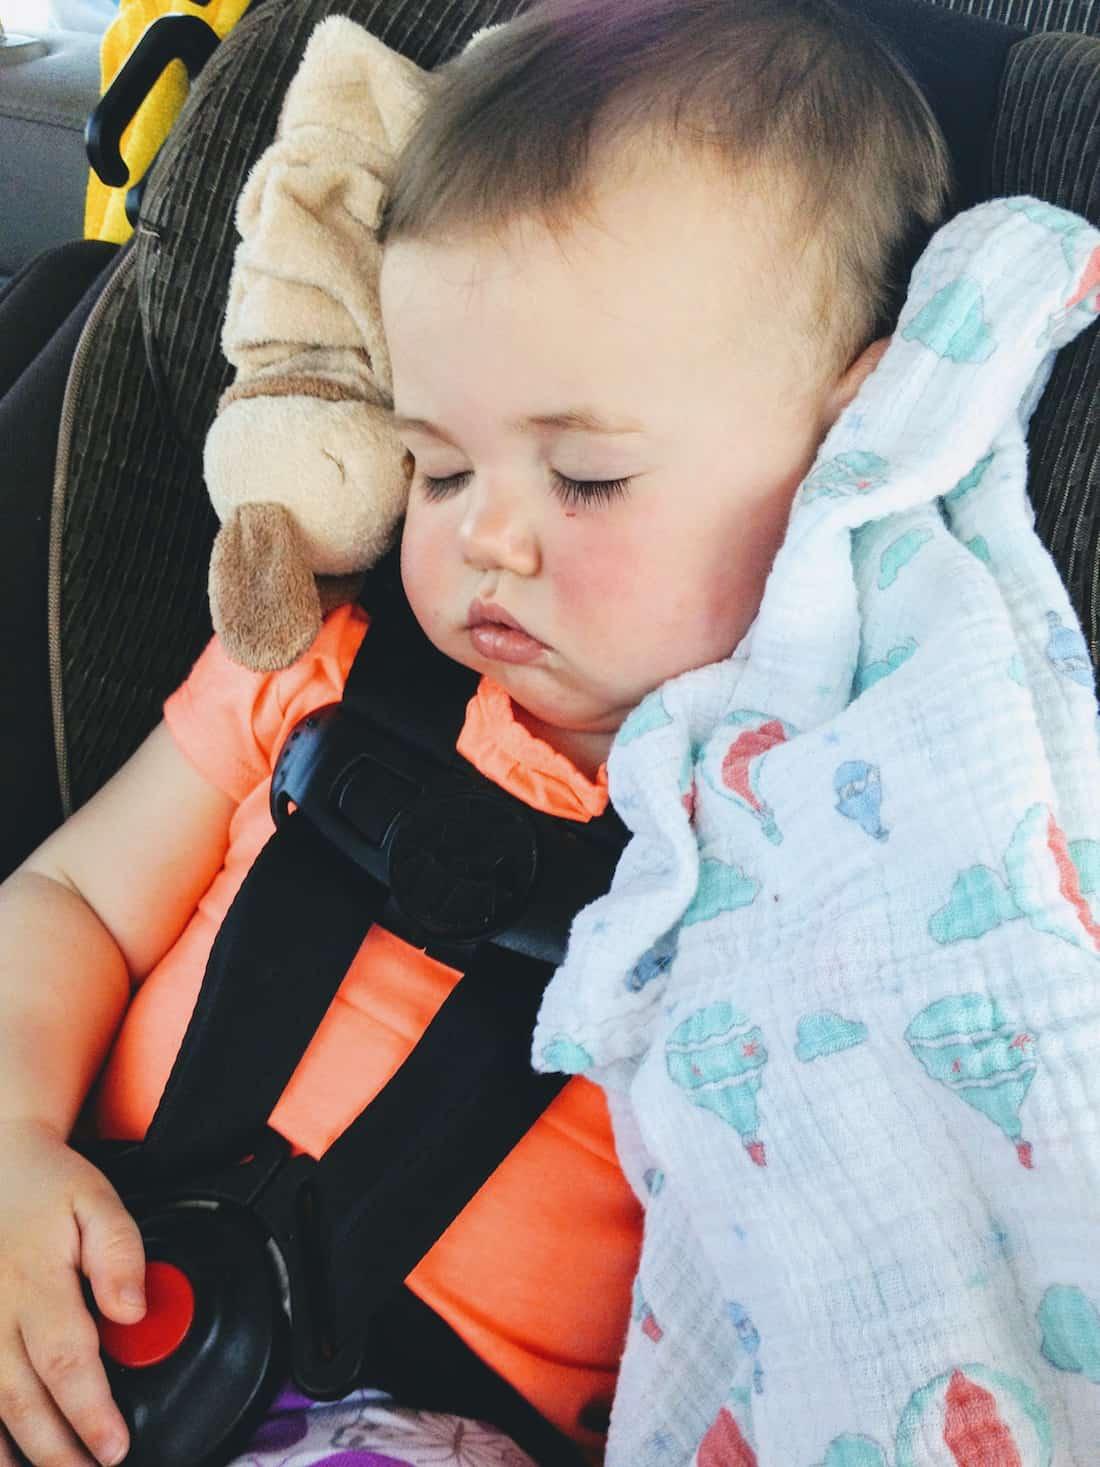 Little girl sleeps in car seat.